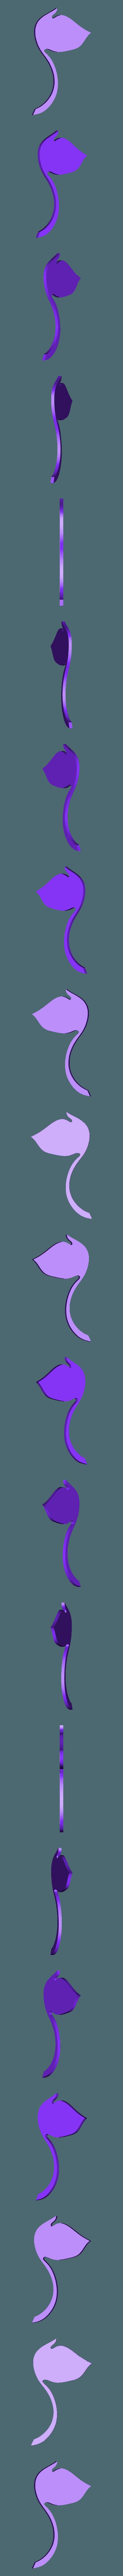 Tail.stl Download free STL file Cow - Harvest Moon • 3D print model, JayOmega